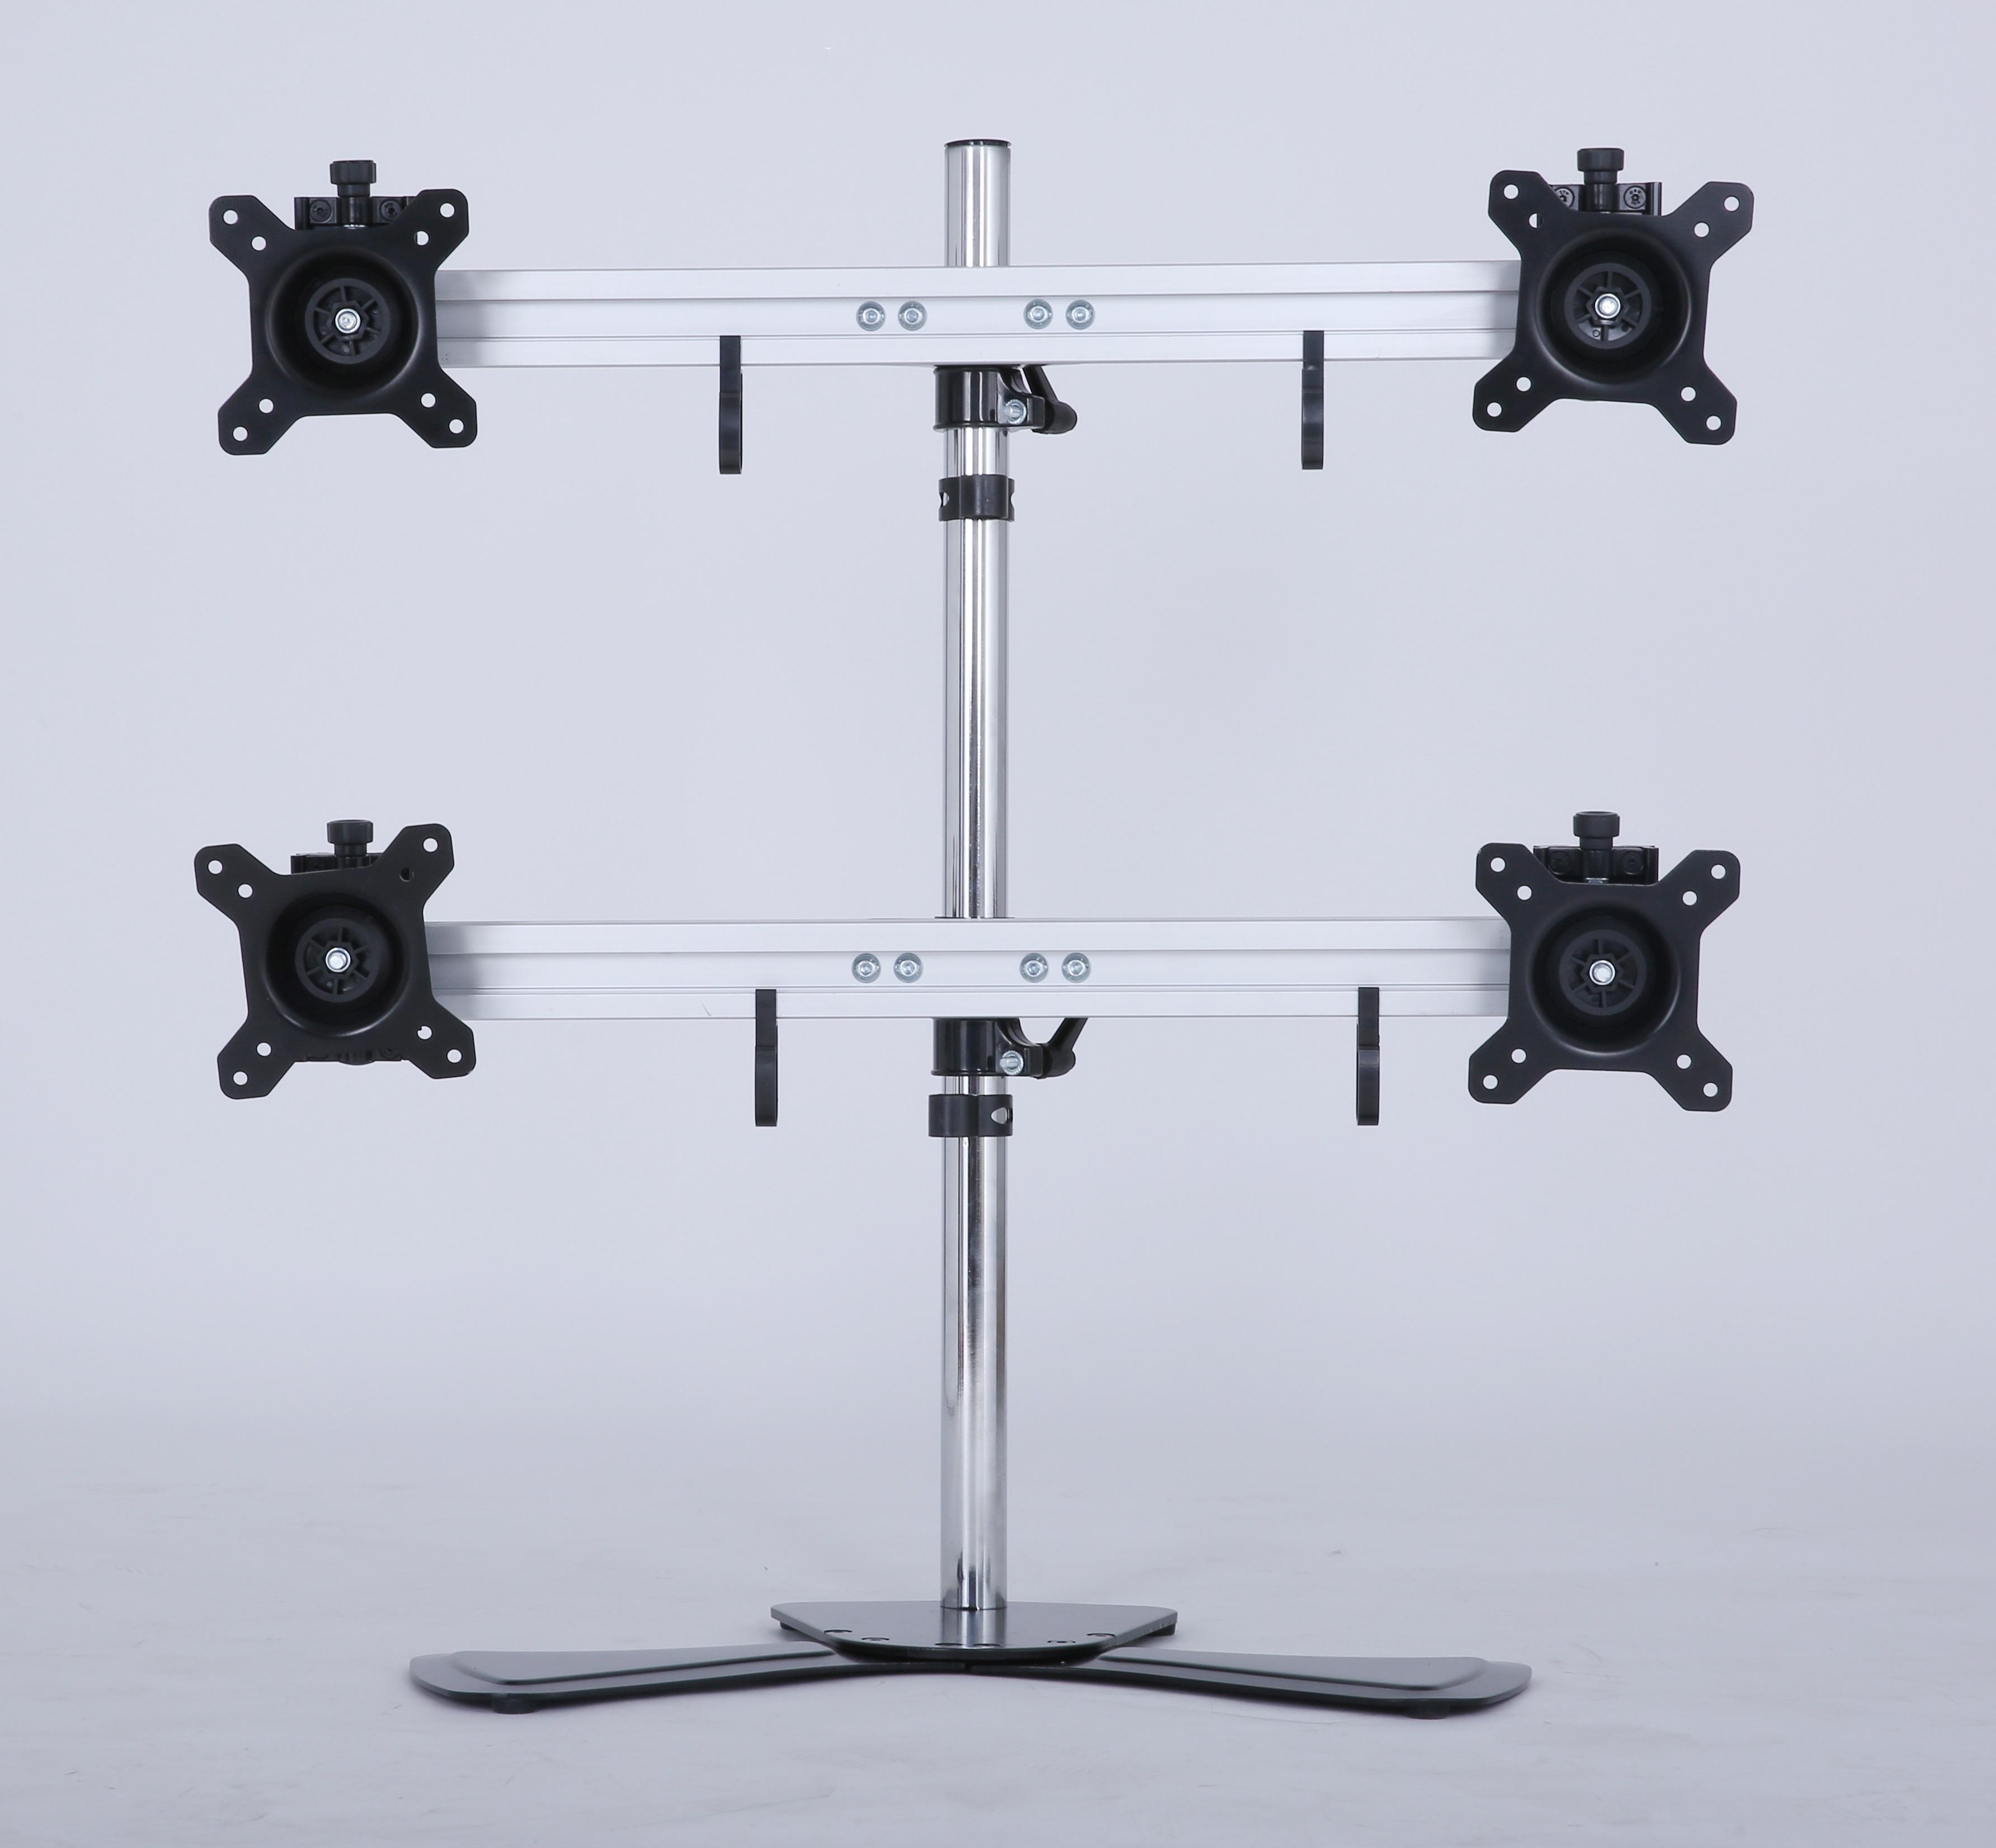 Quad/4/Four XL LCD Monitor Desktop Freestanding Mount Stand  Z2686